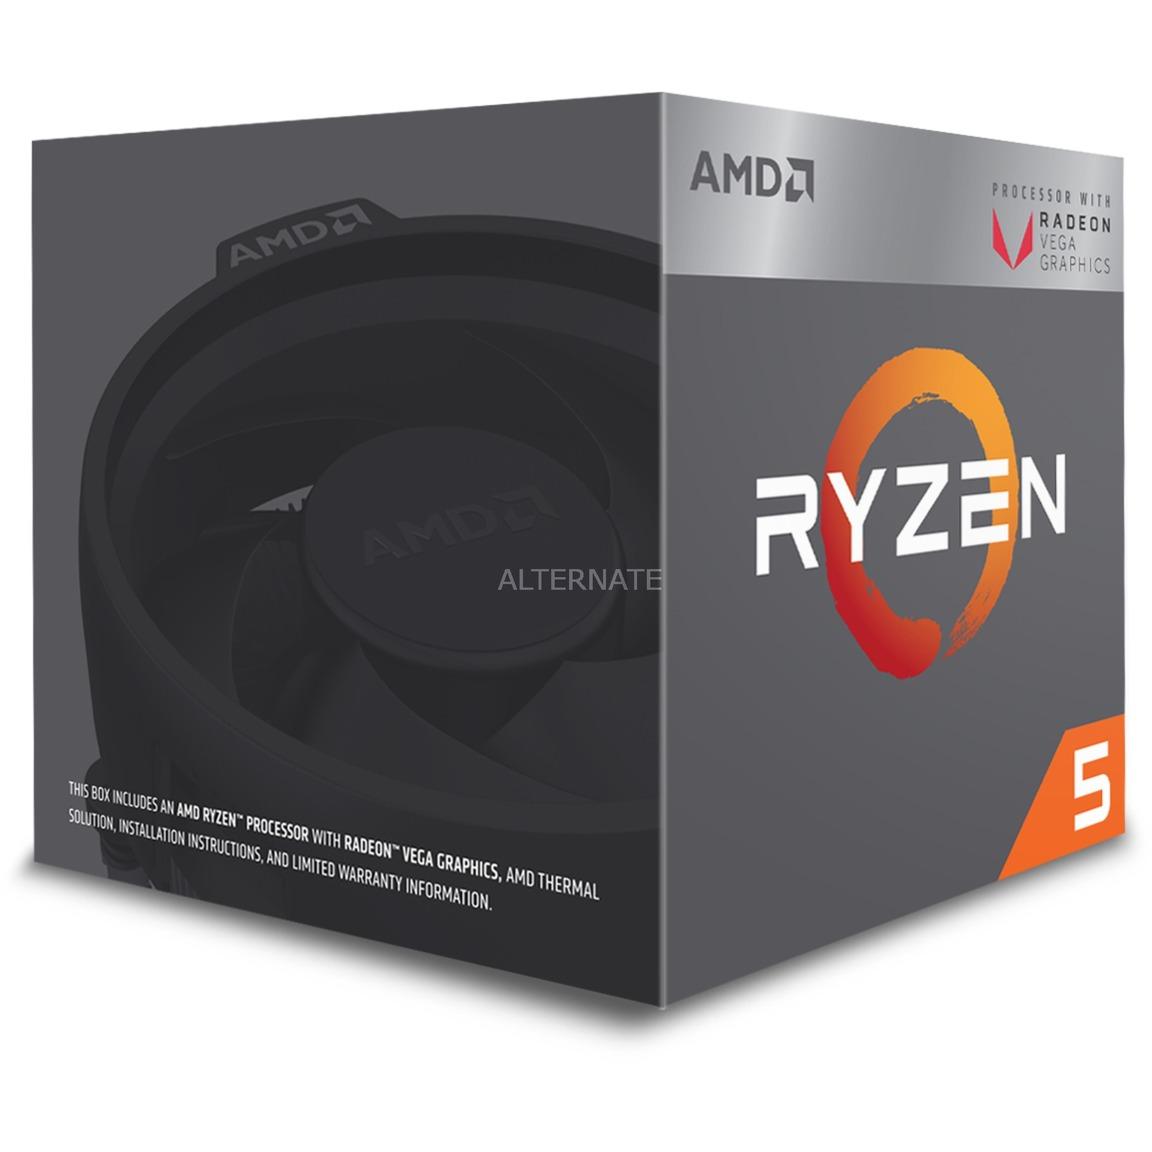 Ryzen 5 2400G 3.6GHz 2MB L2 Caja procesador